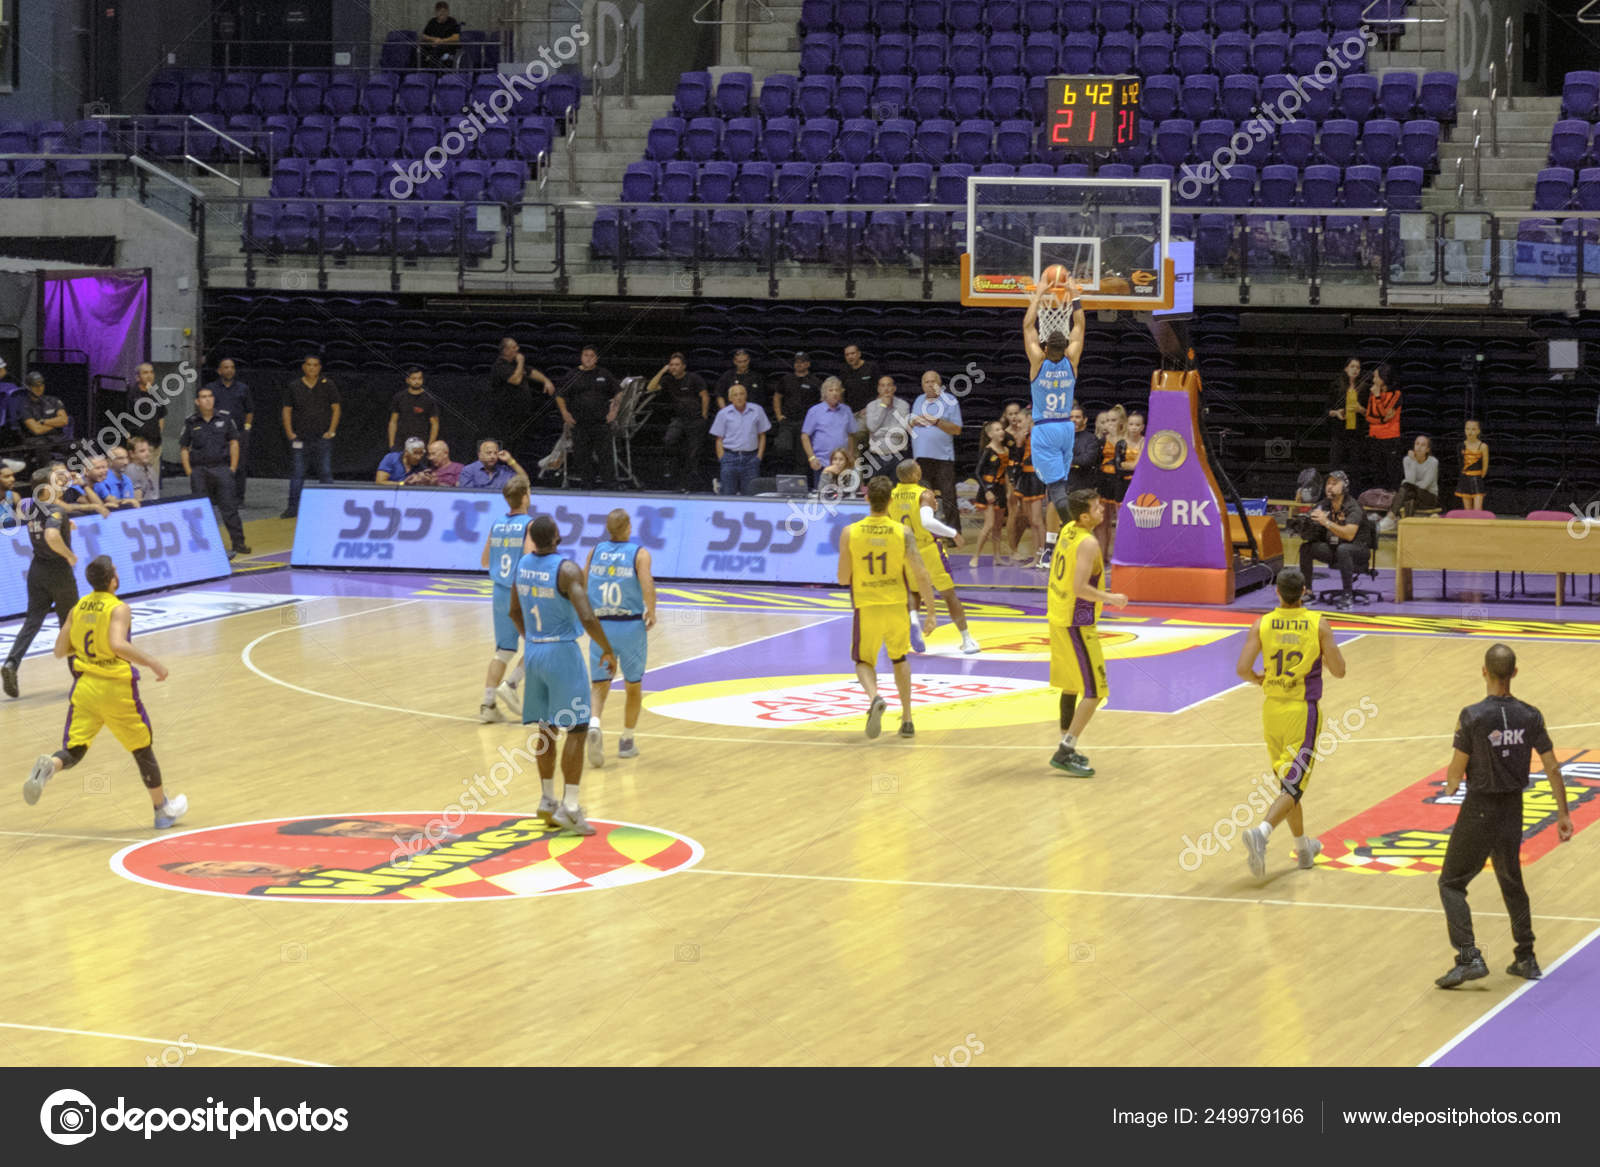 Israel Holon Toto Arena October 2017 Game Basketball Hapoel